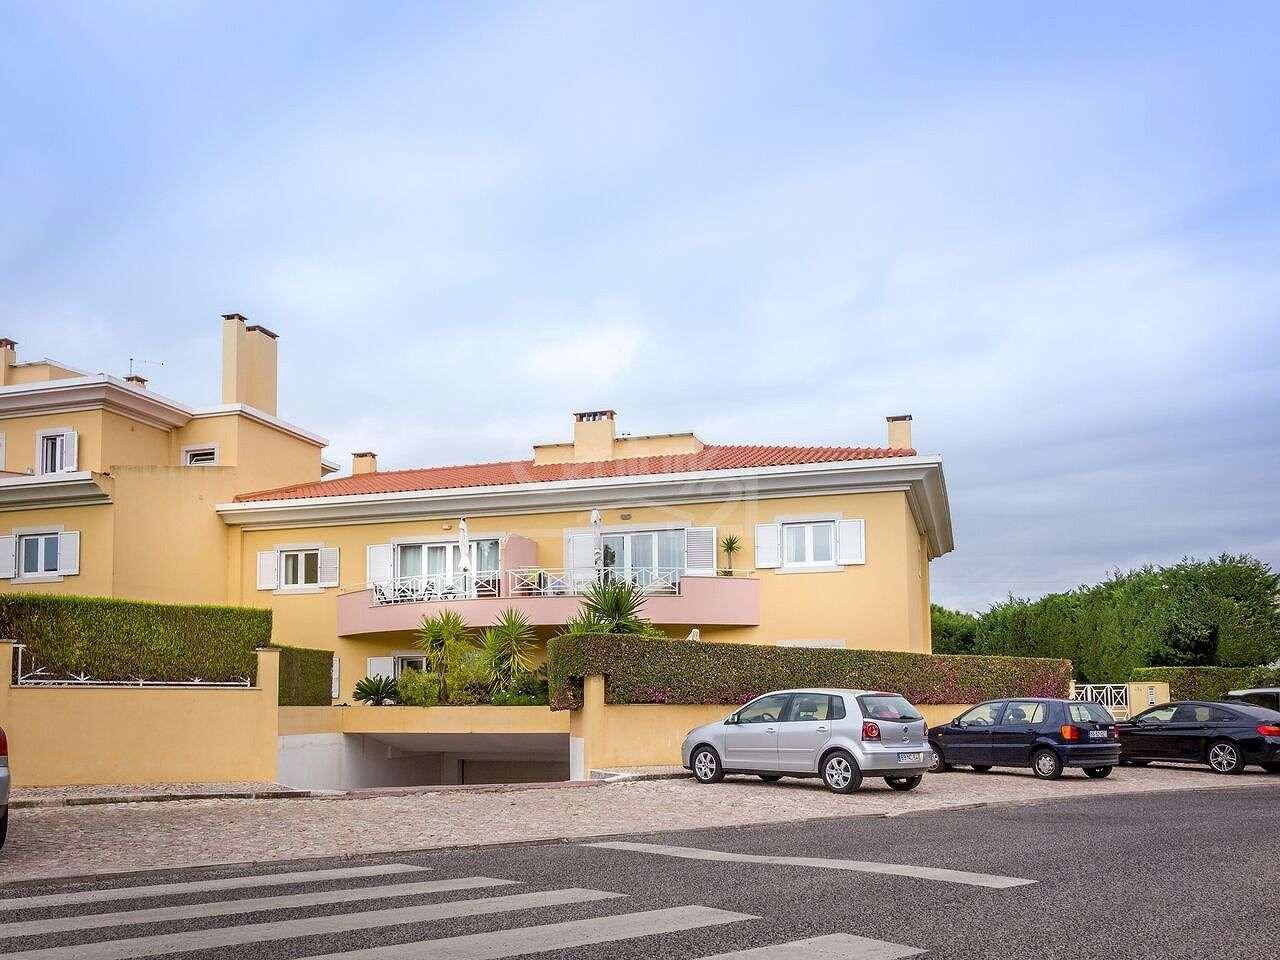 Apartamento para comprar, Cascais e Estoril, Cascais, Lisboa - Foto 1